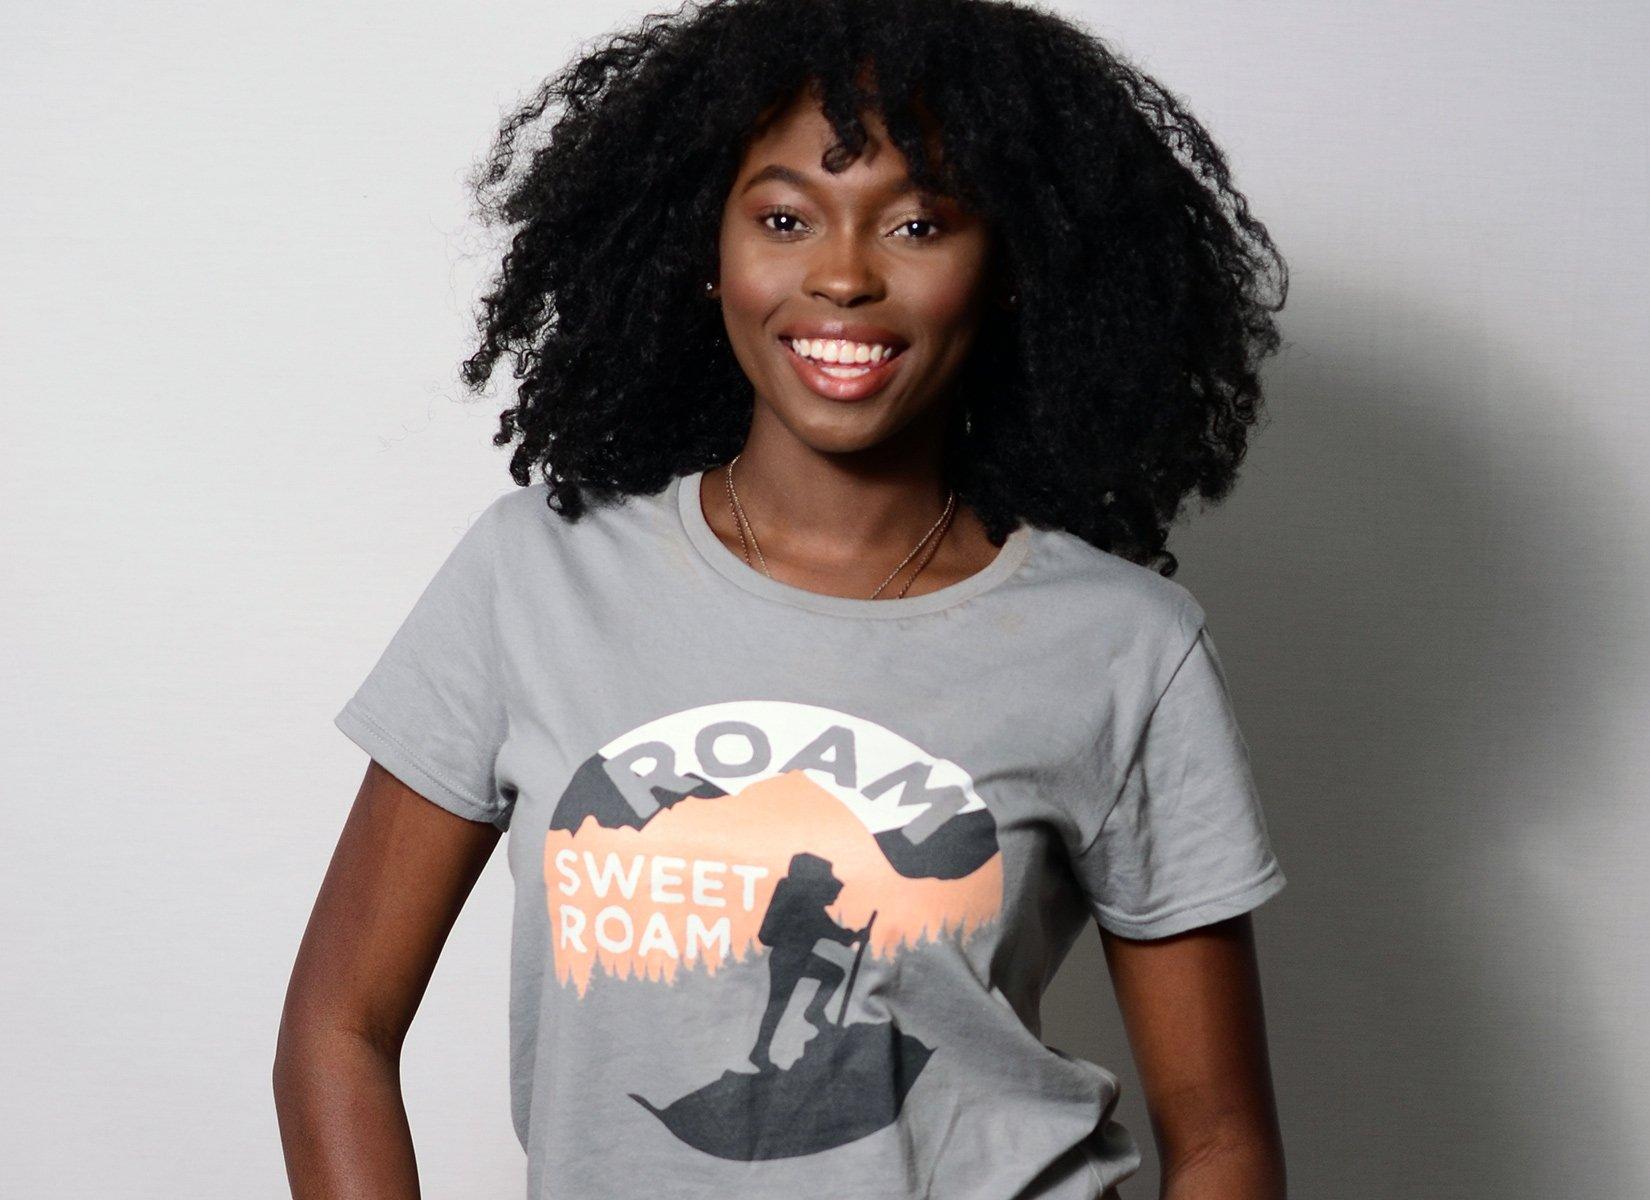 Roam Sweet Roam on Womens T-Shirt